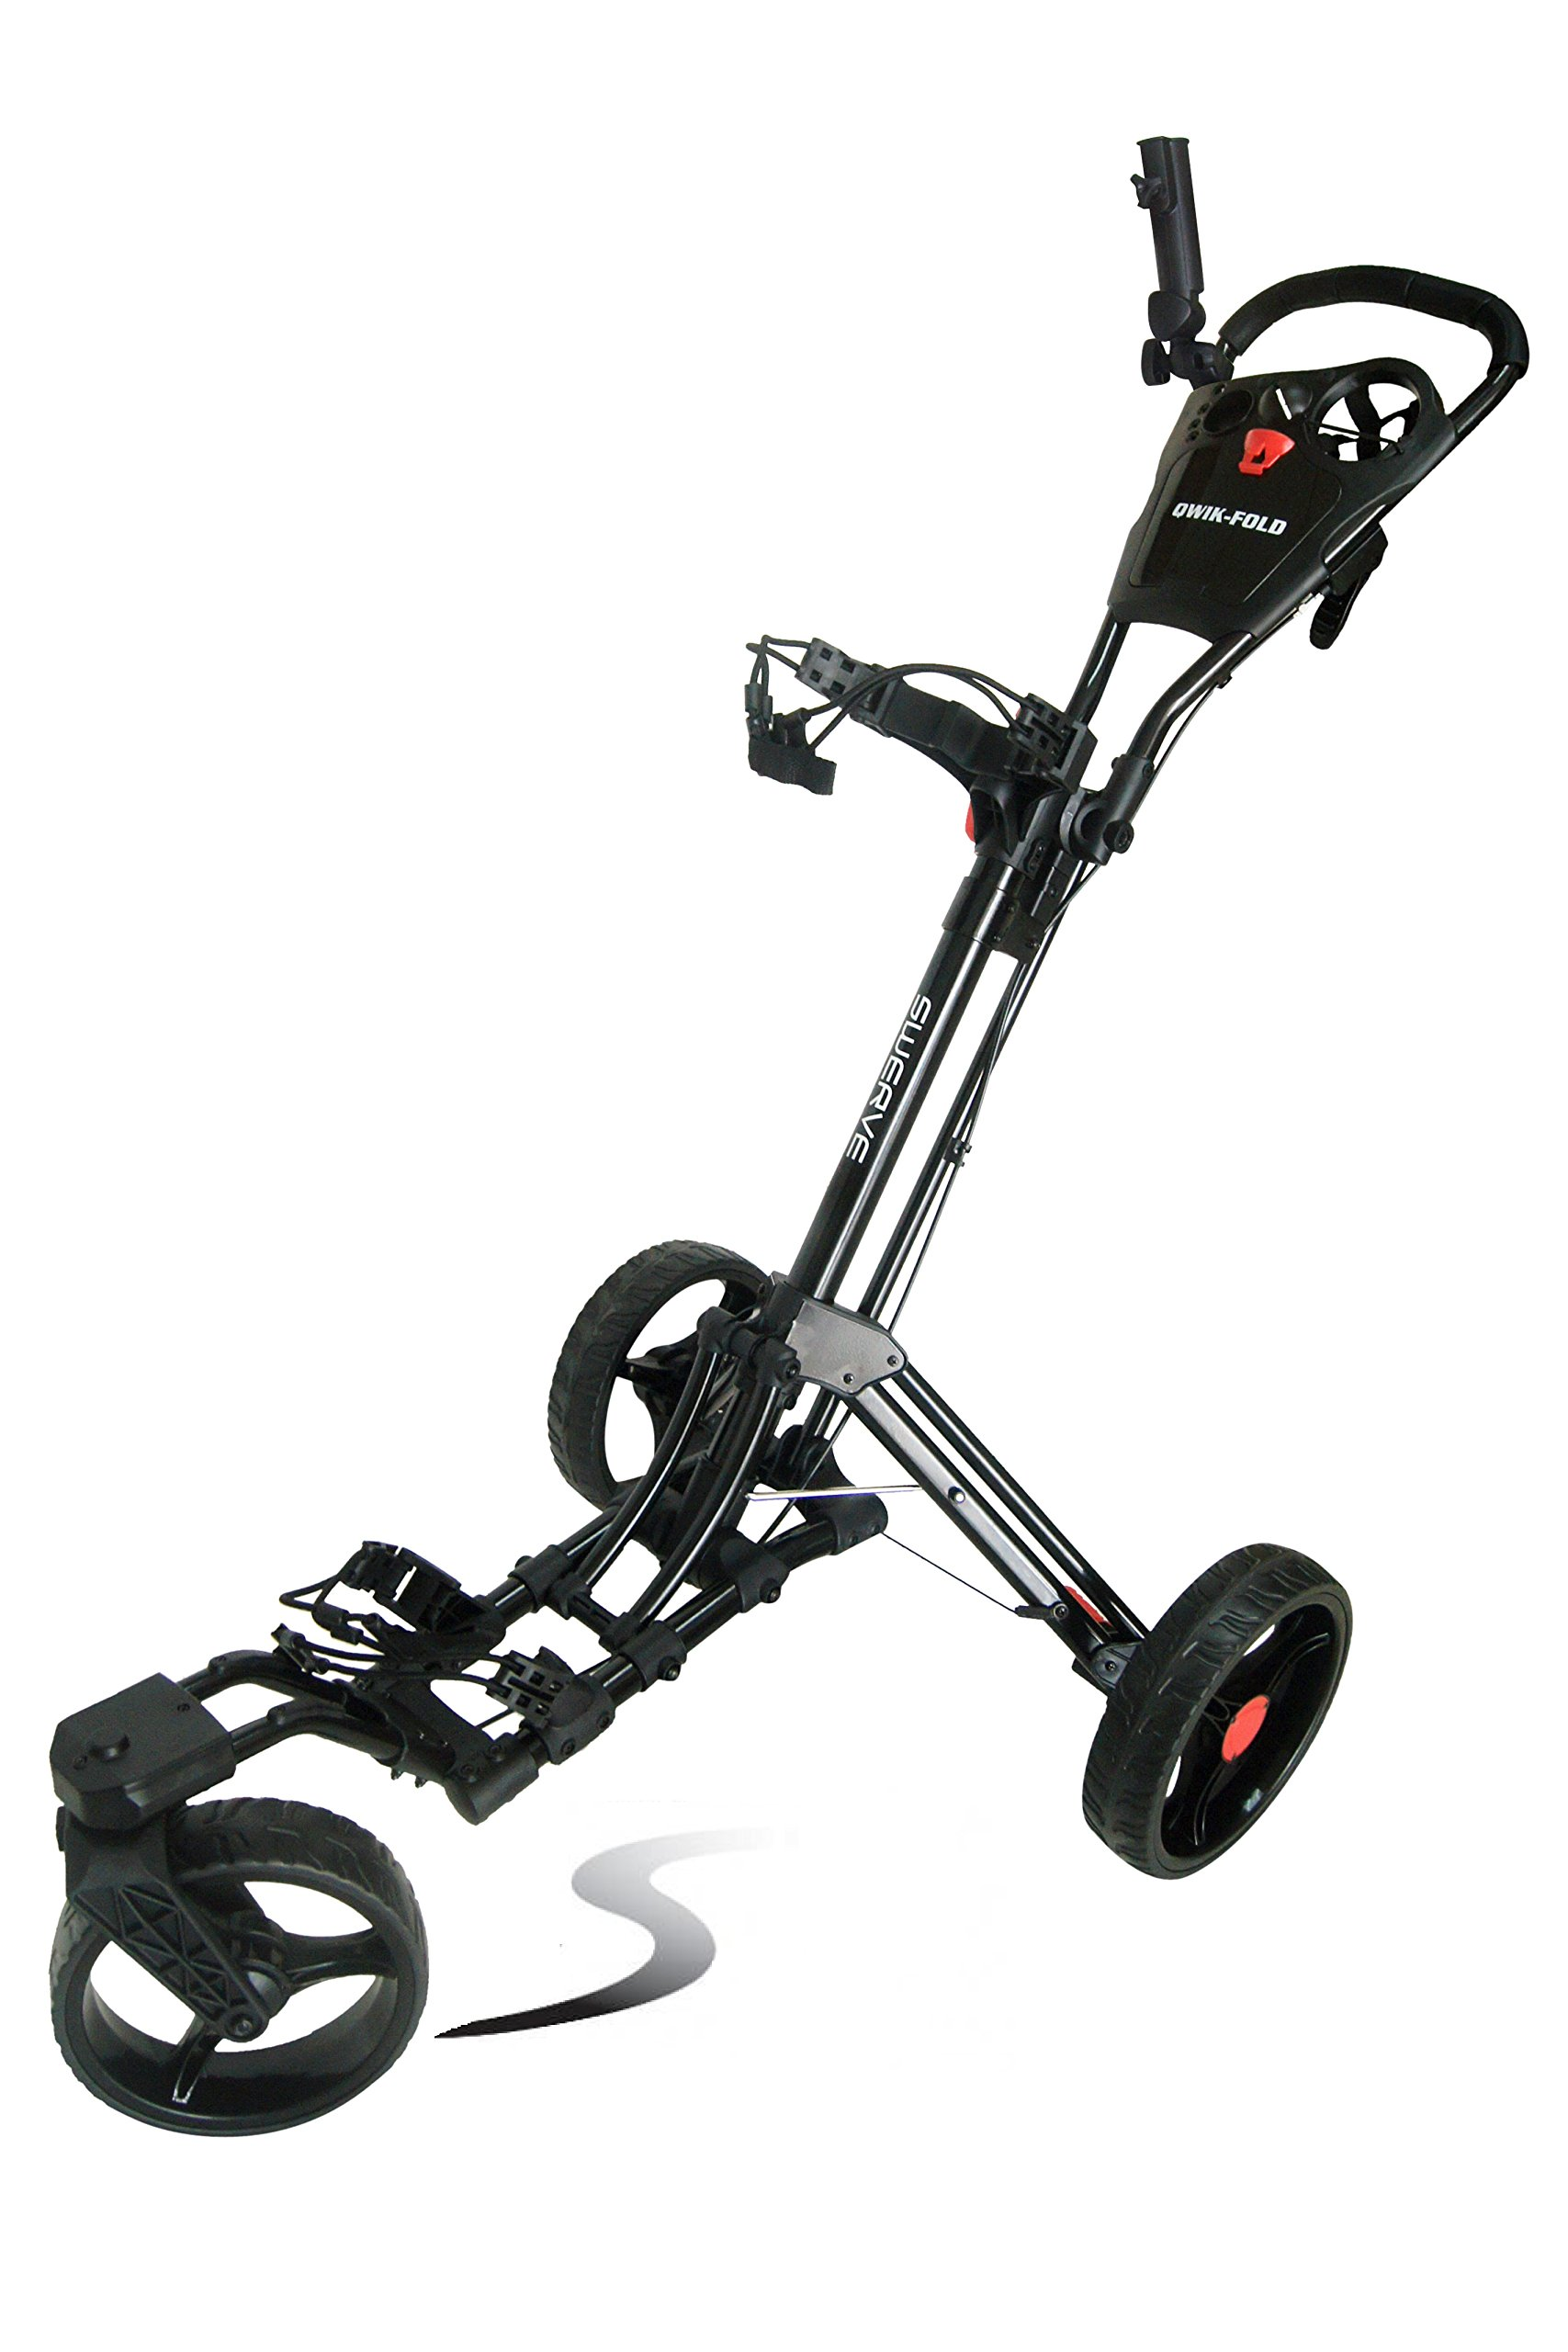 Swerve Founders Club 360 Swivel Wheel Qwik Fold Golf Push Cart (Black/Black)